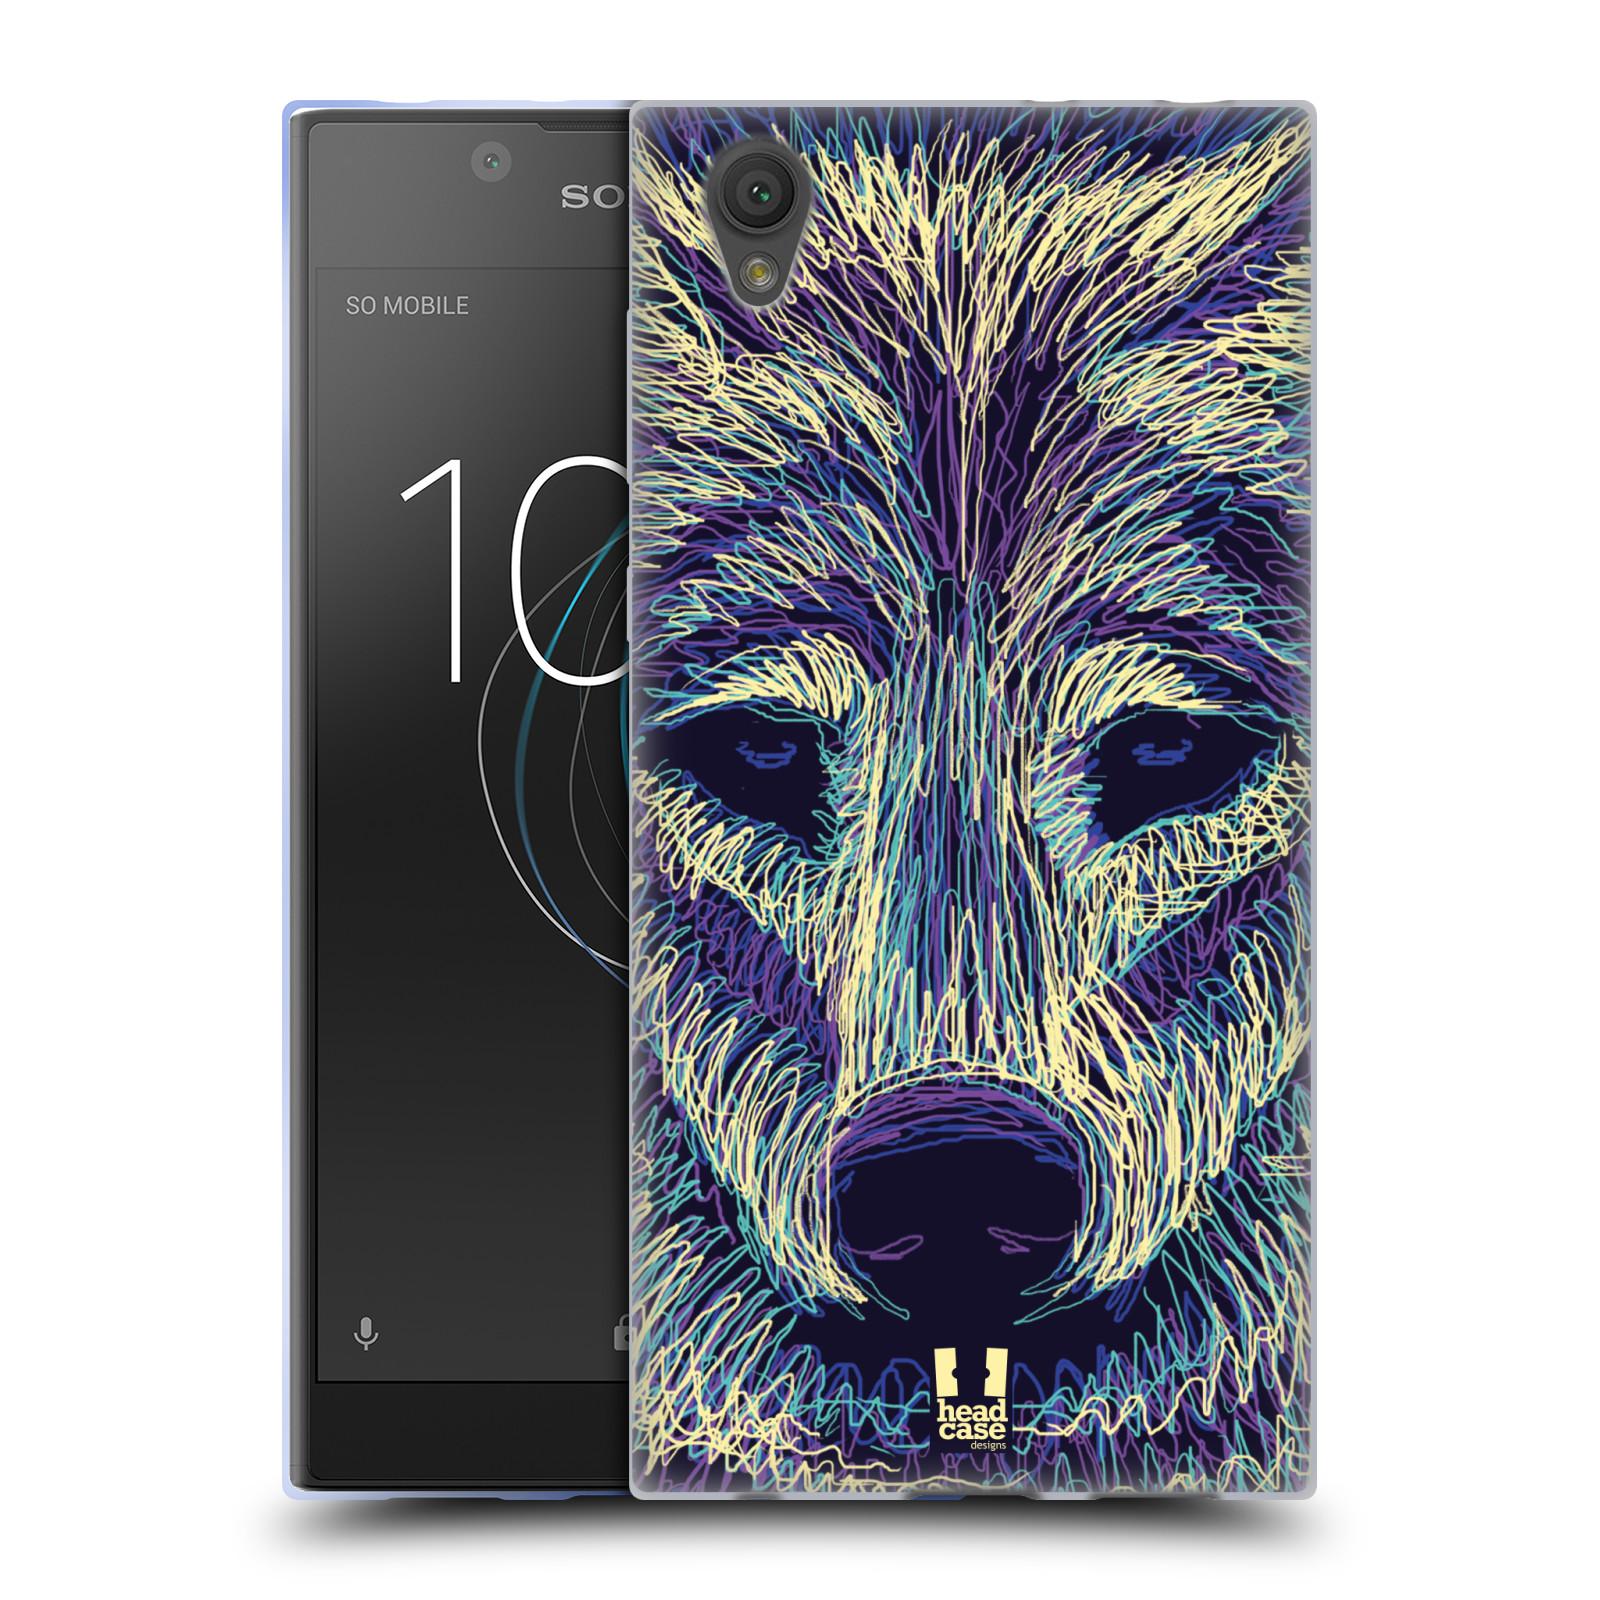 Silikonové pouzdro na mobil Sony Xperia L1 - Head Case - SCRIBBLE VLK (Silikonový kryt či obal na mobilní telefon Sony Xperia L1 G3311 s motivem SCRIBBLE VLK)